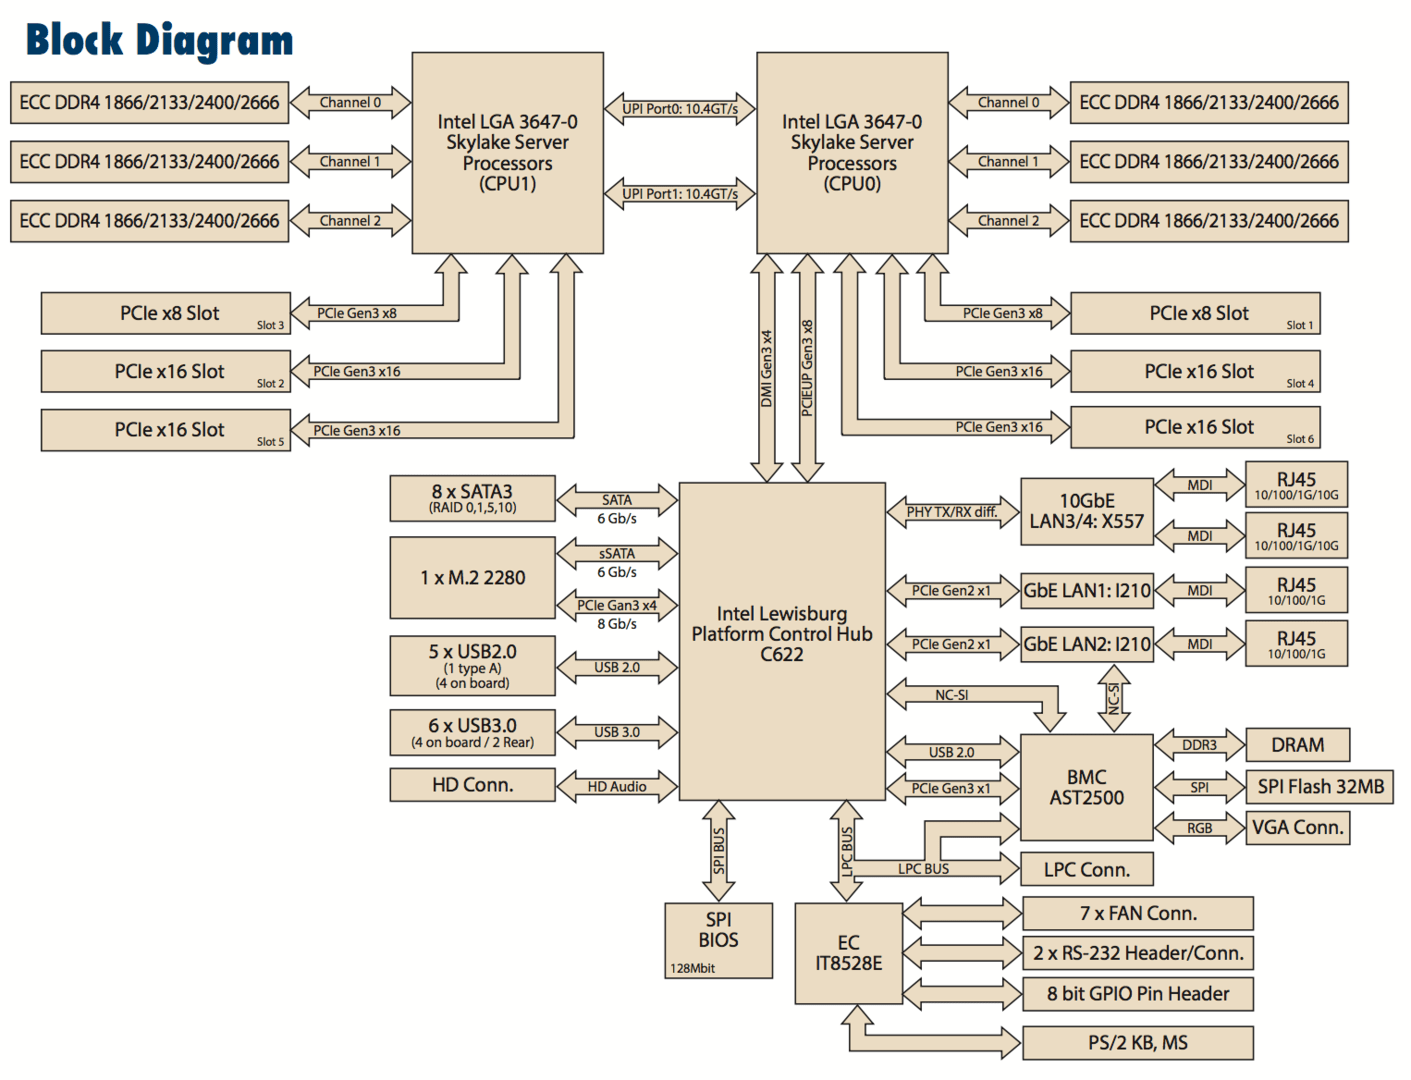 Blockdiagramm ASMB-825: Skylake-SP, zwei Sockel, ATX